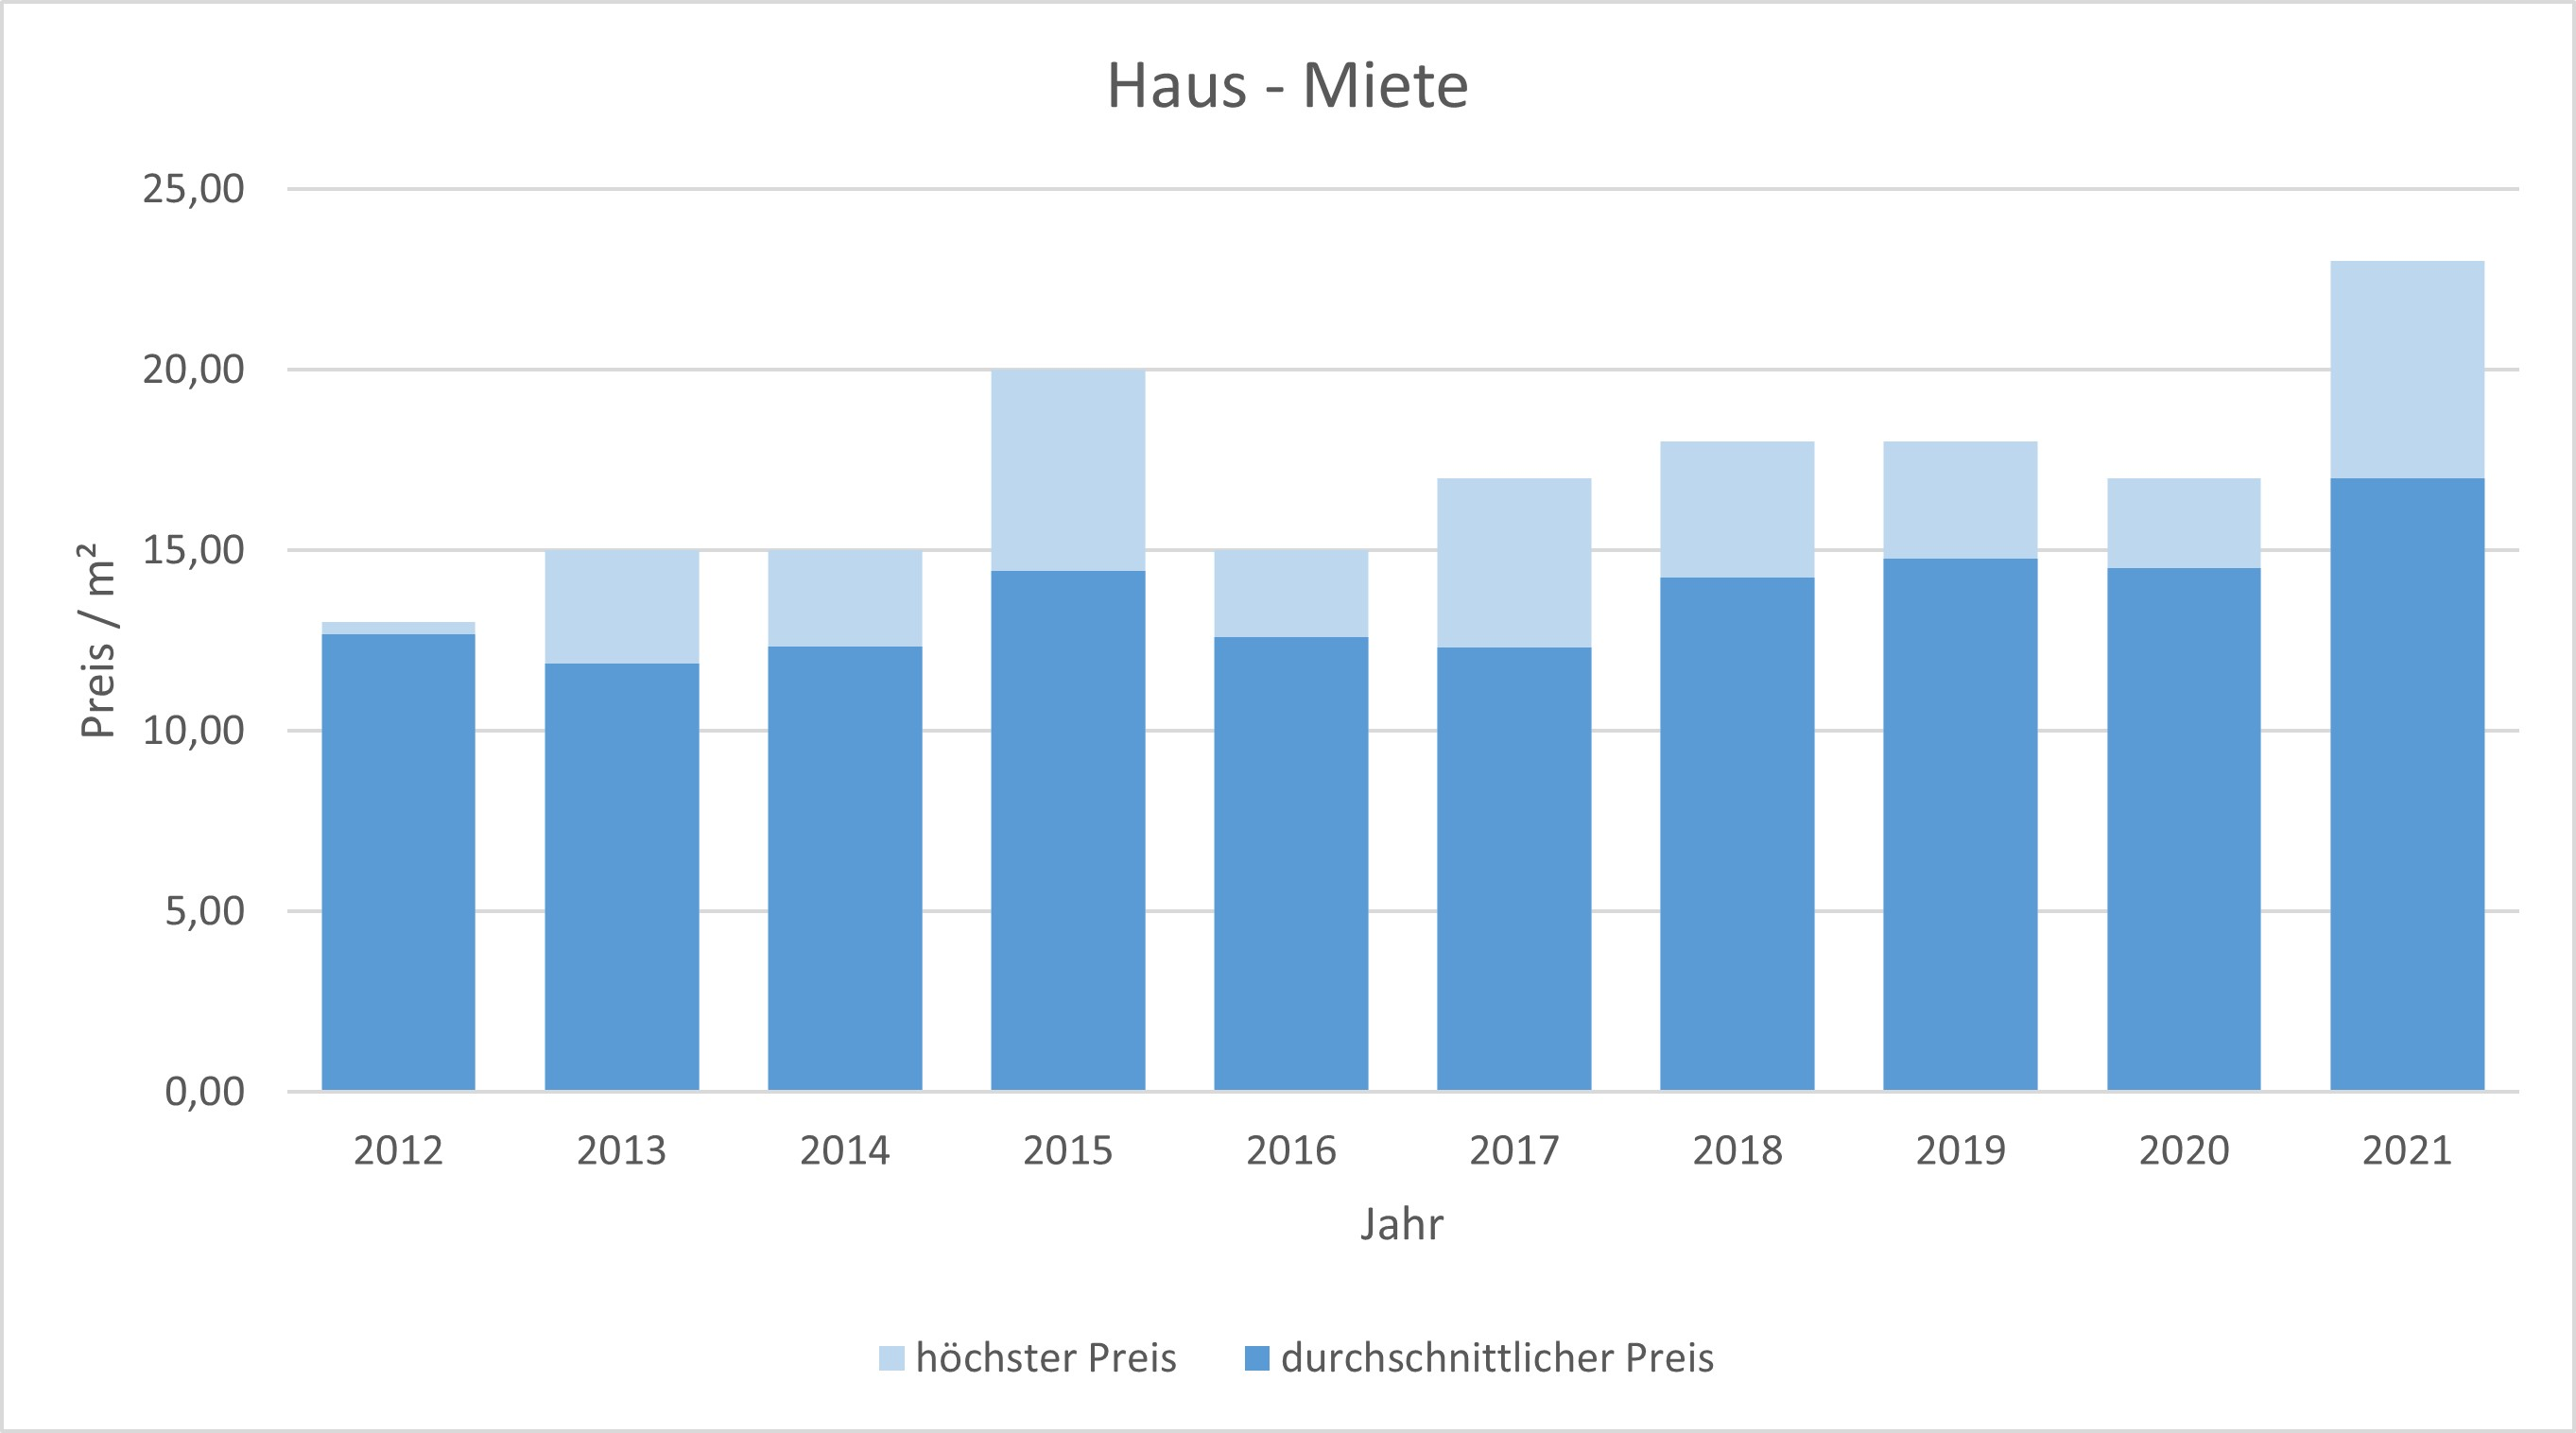 Putzbrunn Haus mieten vermieten qm Preis Bewertung Makler www.happy-immo.de 2019 2020 2021